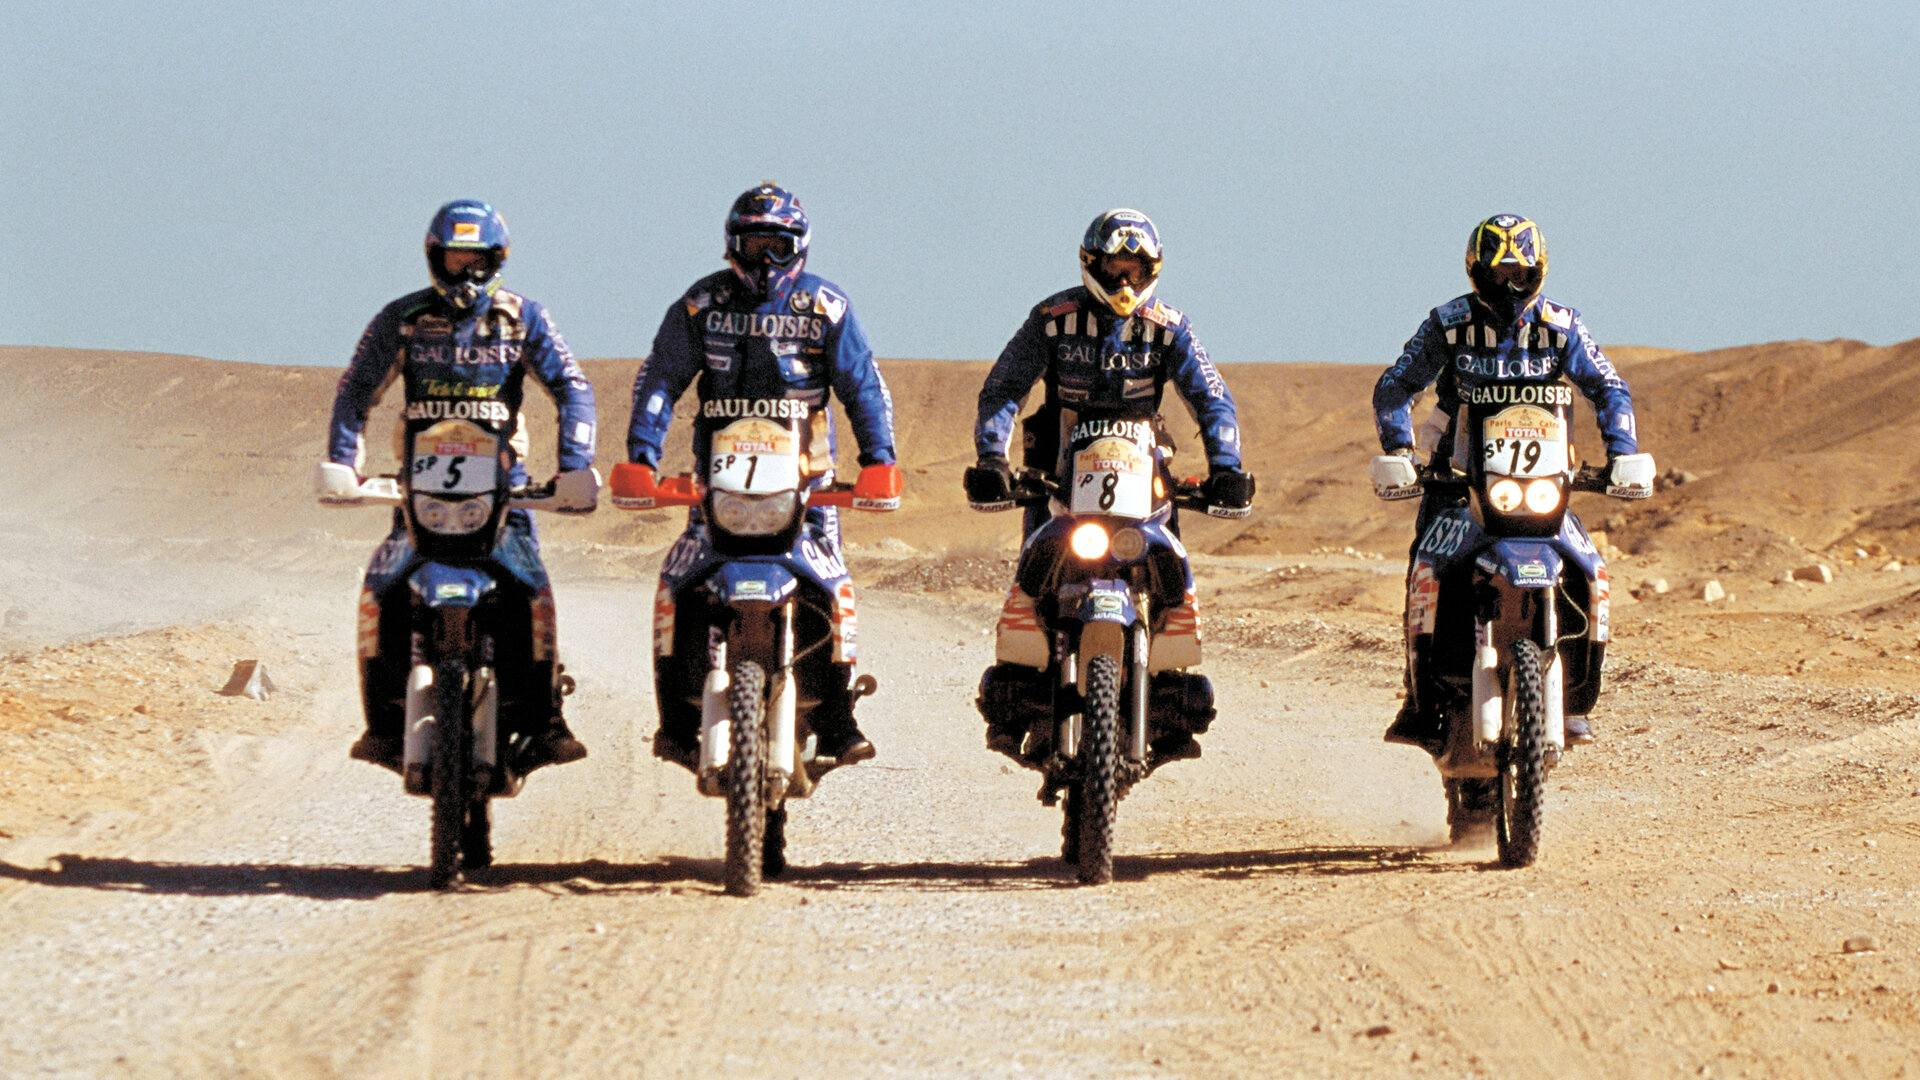 Equipo BMW Motorrad Team Gauloises 2000